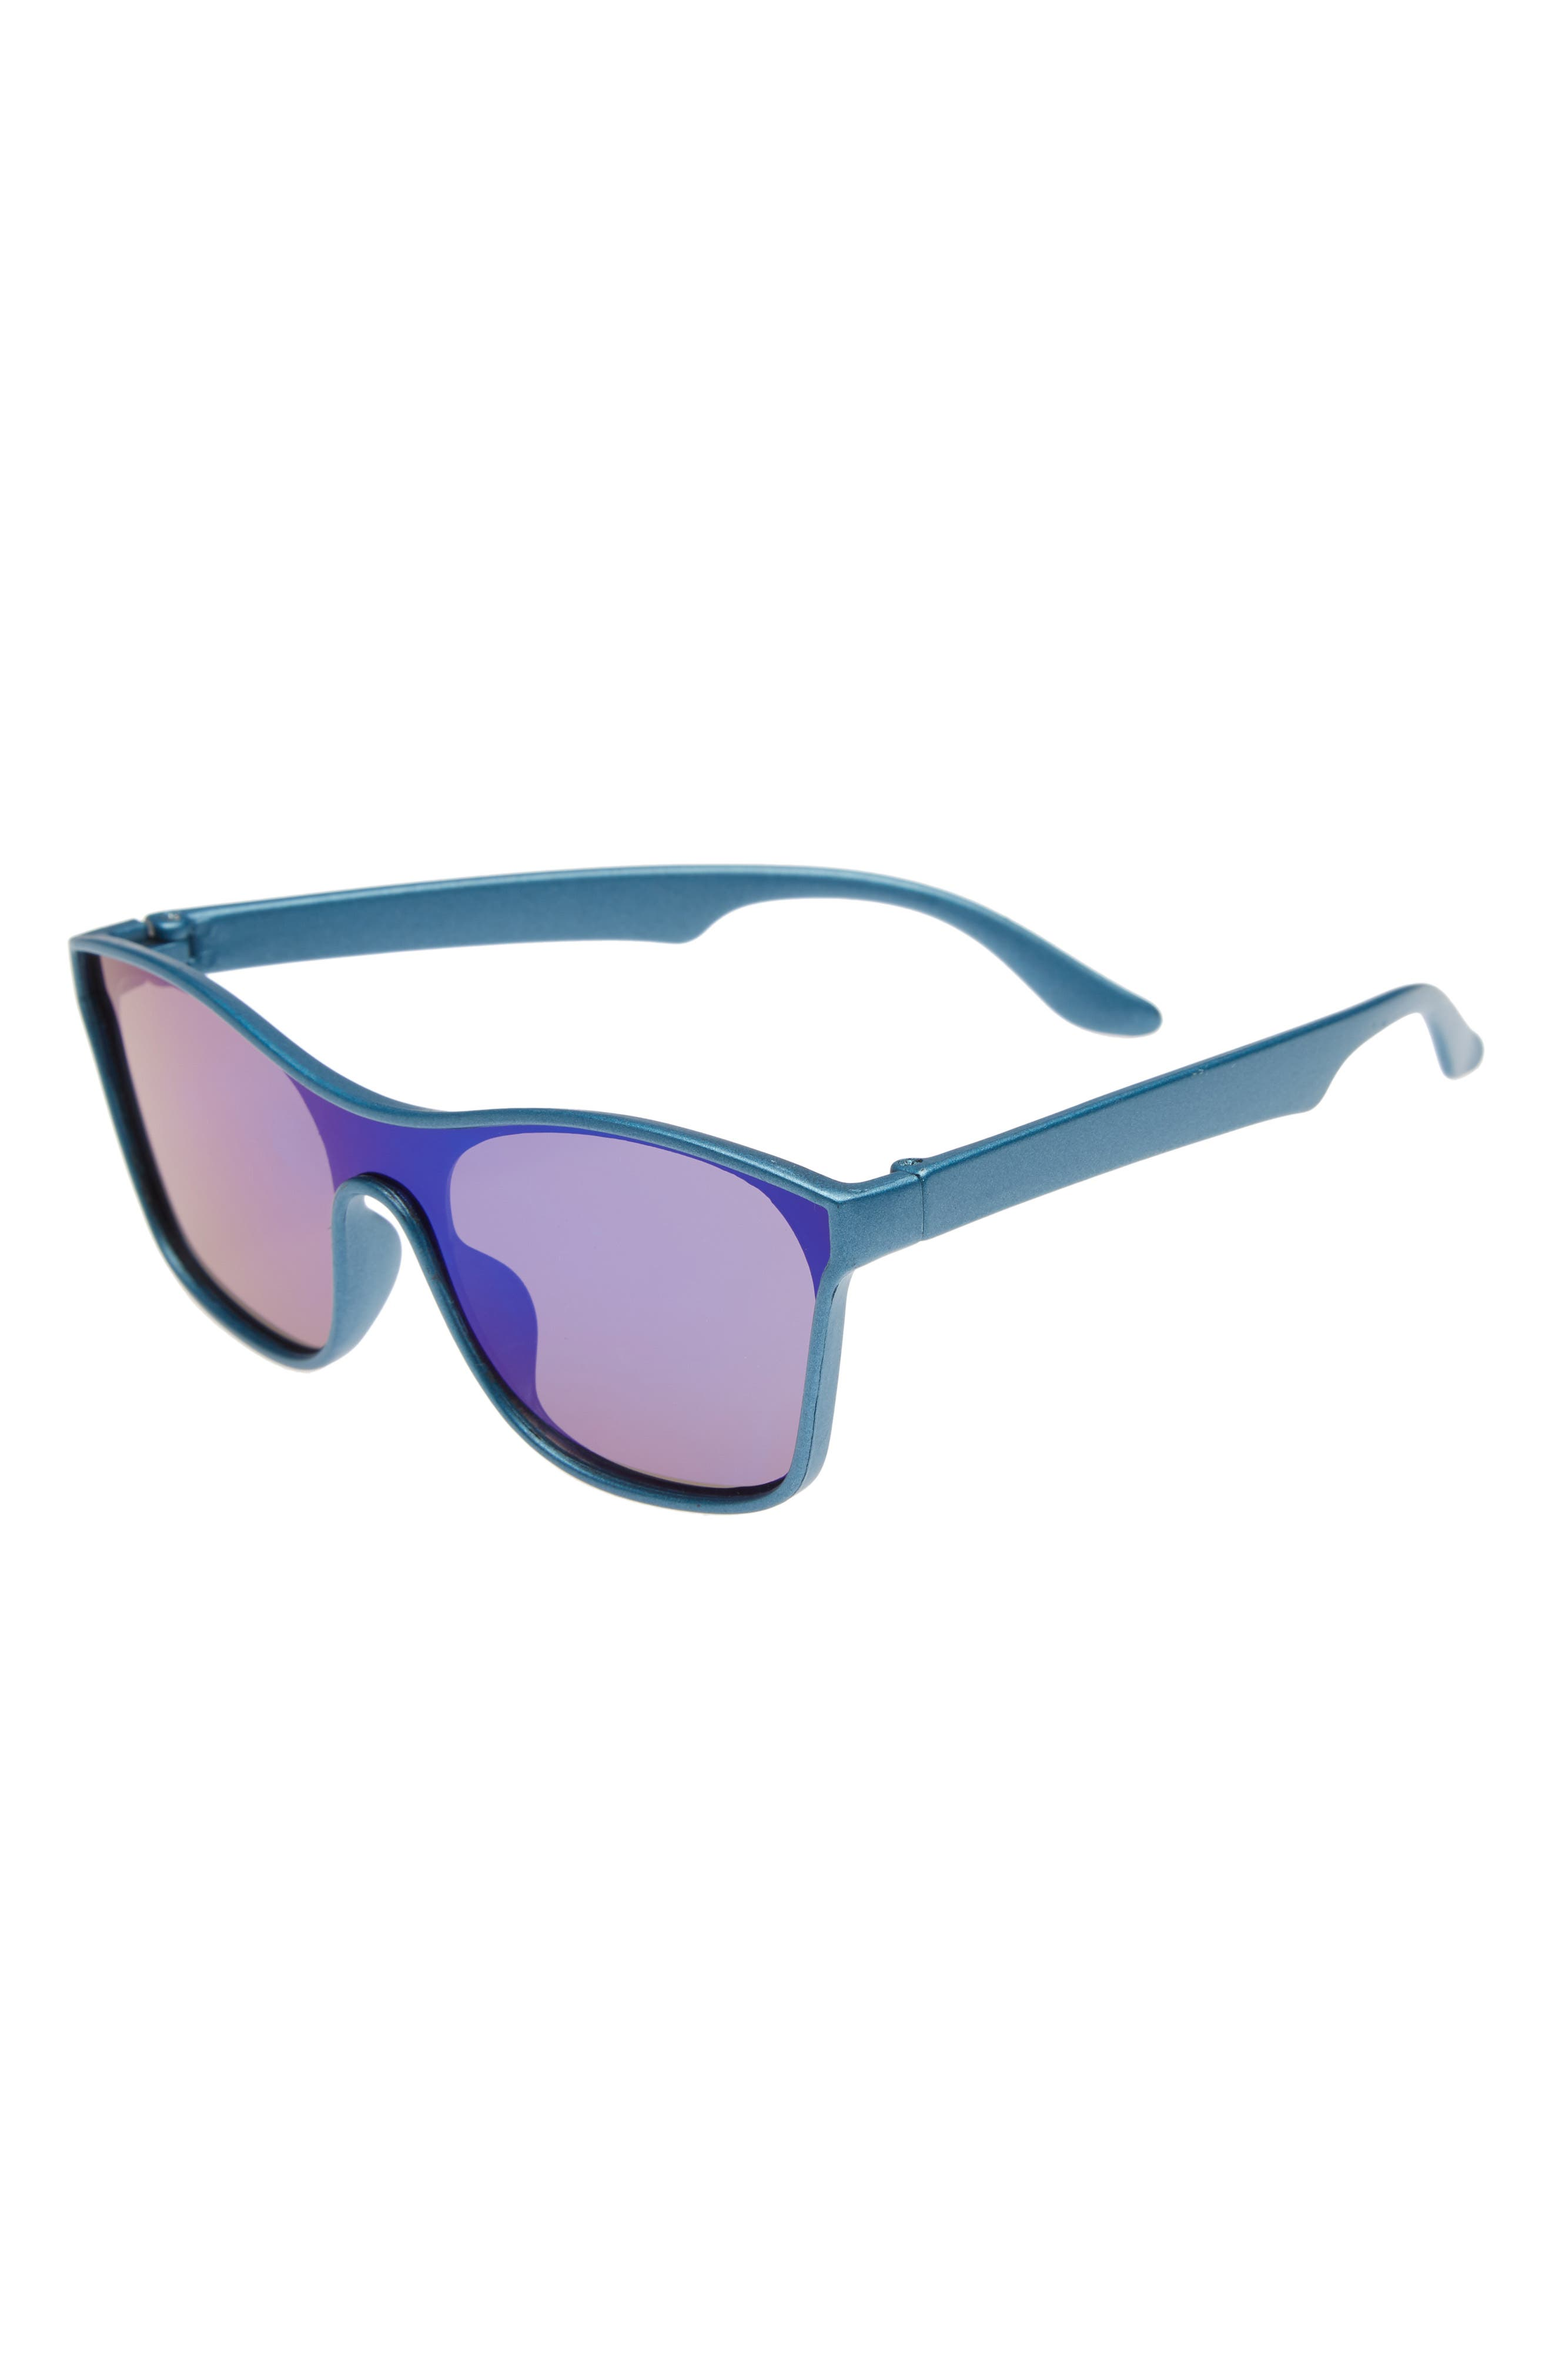 Mirrored Sunglasses,                             Main thumbnail 1, color,                             Blue Mirror